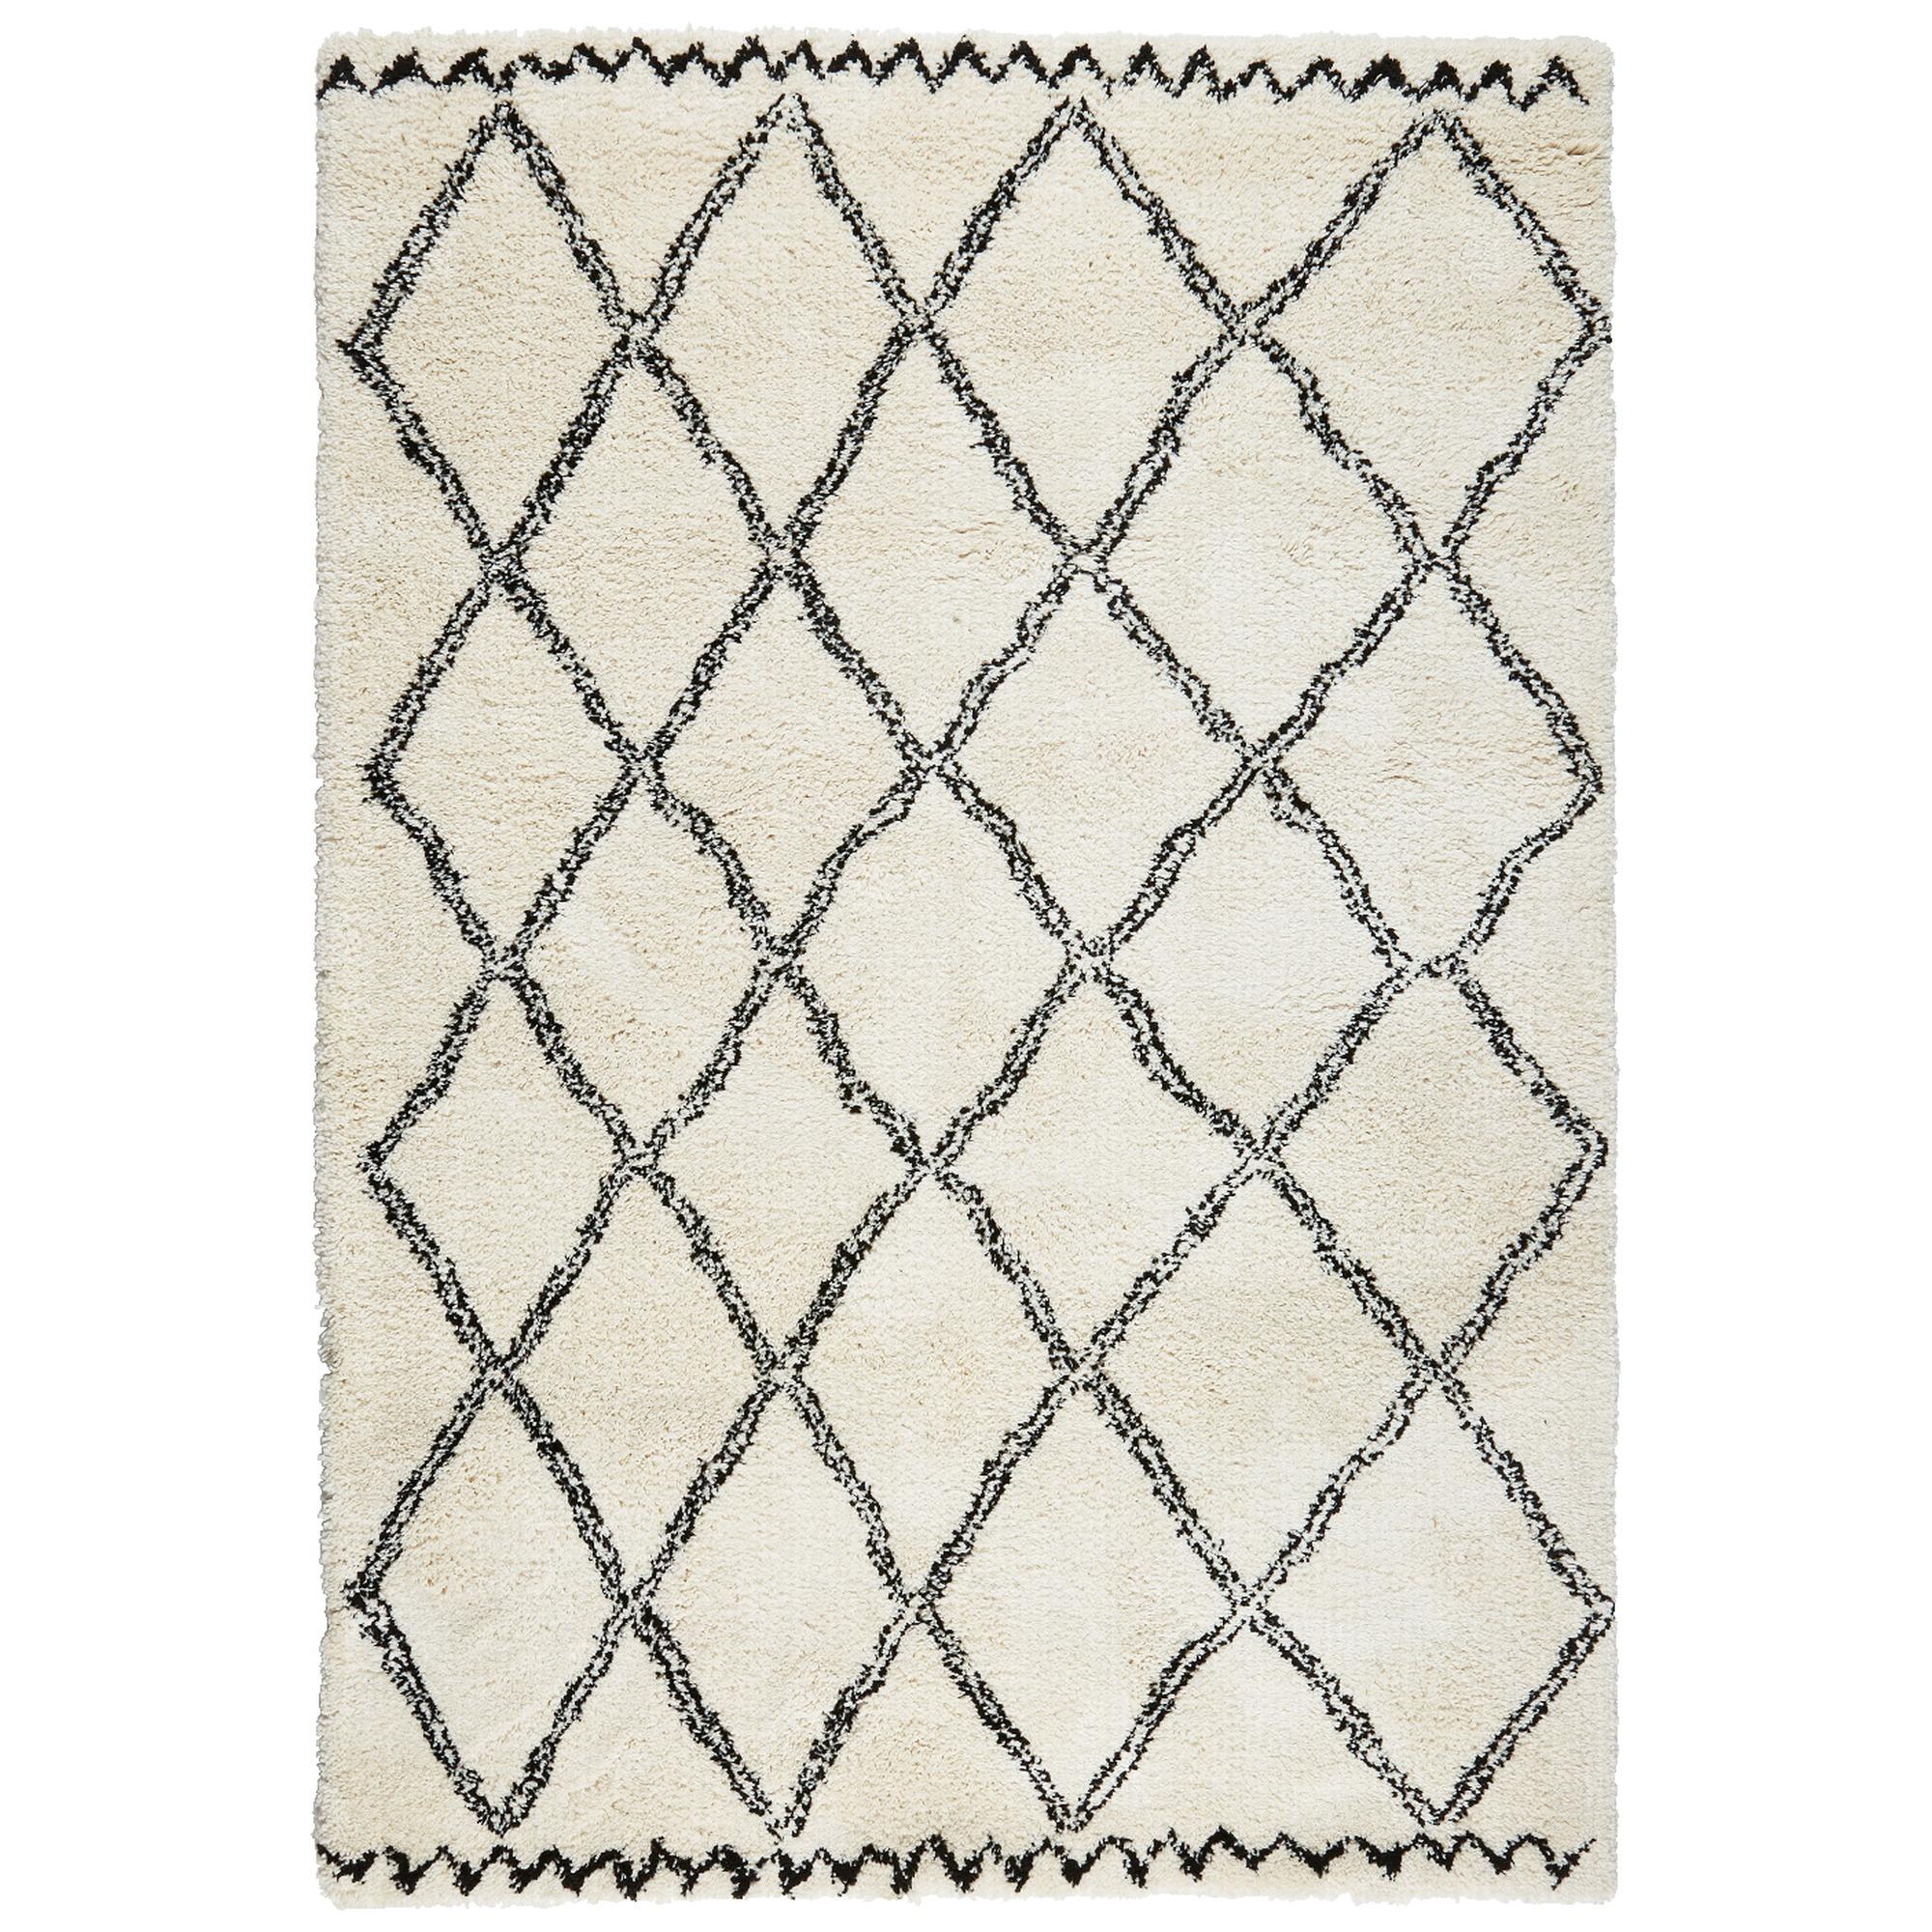 Vloerkleed Varamin Zwart/wit 160x230 cm